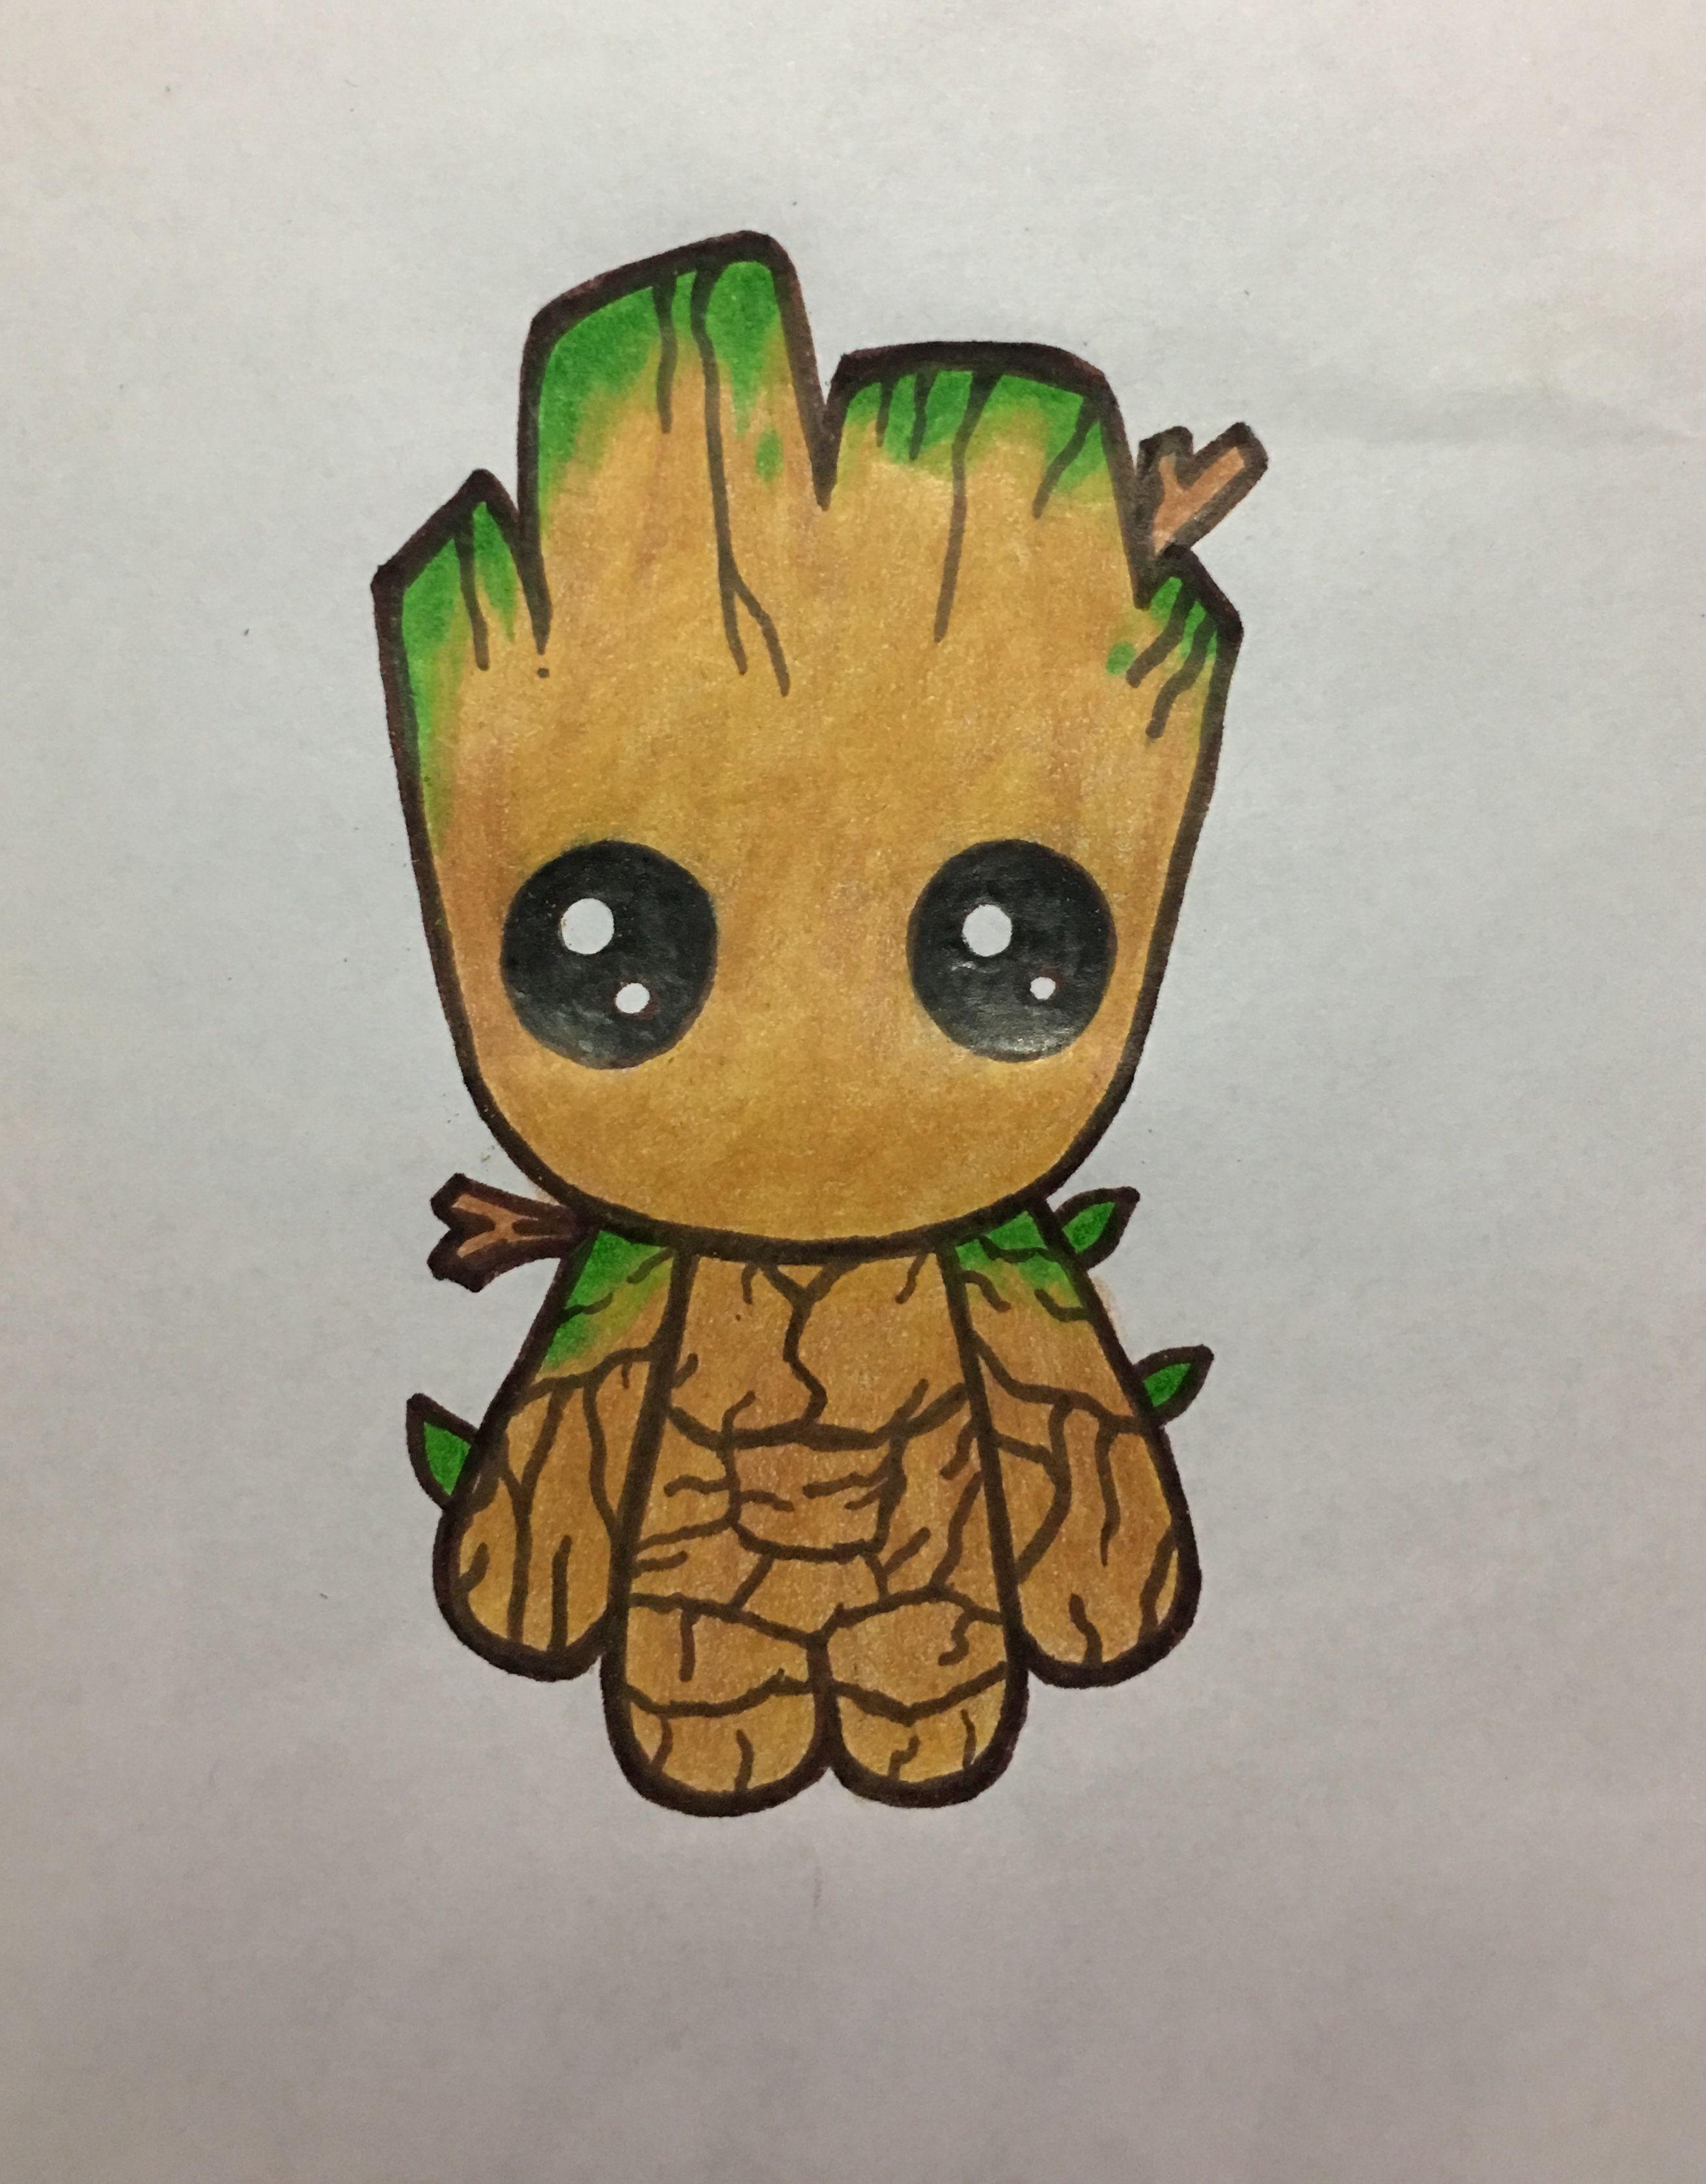 Baby Groot Dibujo Sobre Papel Pintados Con Lapices Giotto Dibujos Kawaii Dibujos Bonitos Dibujos Kawaii Tiernos